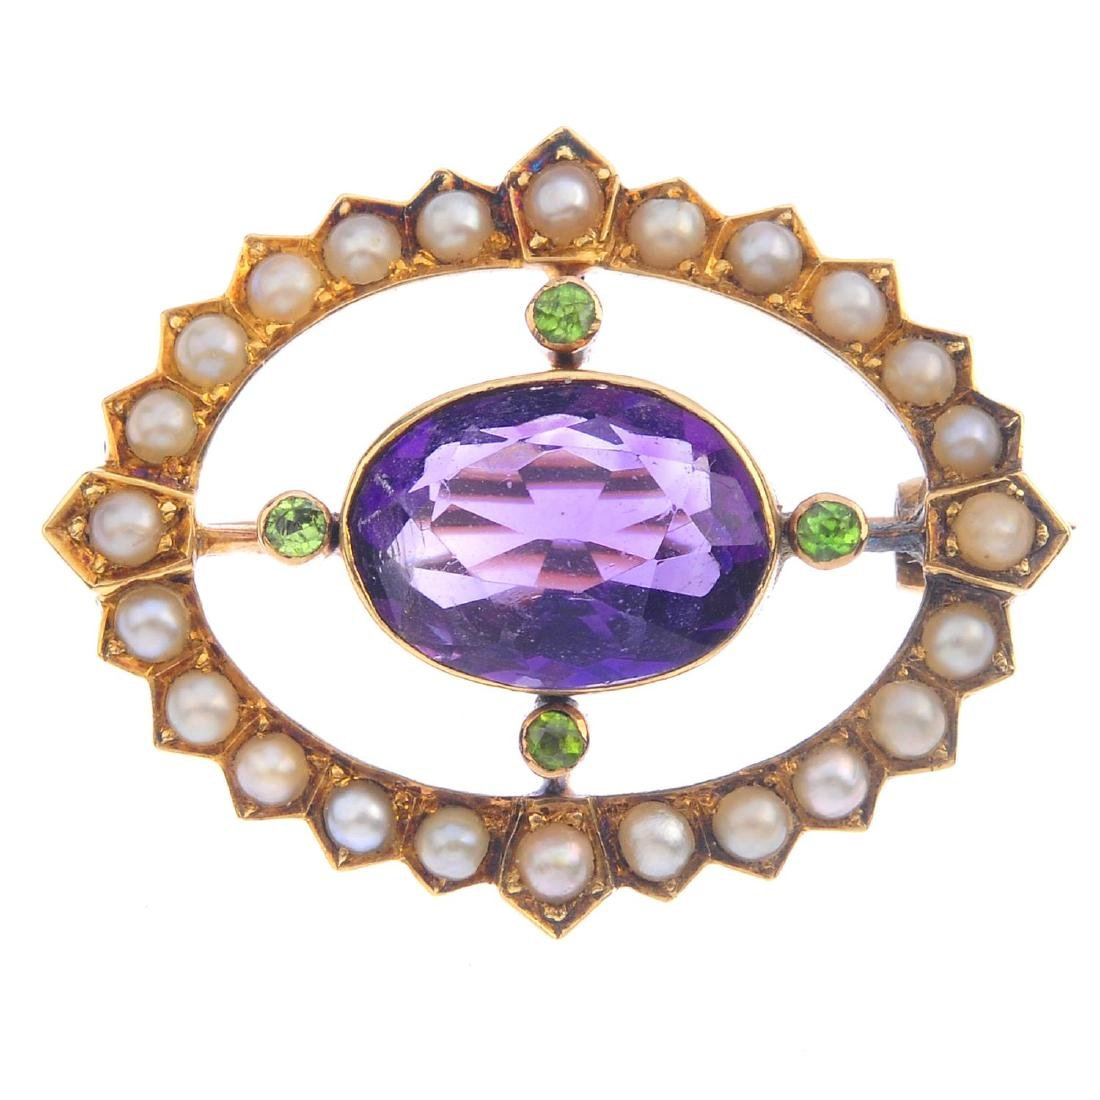 An Edwardian 15ct gold split pearl brooch. The